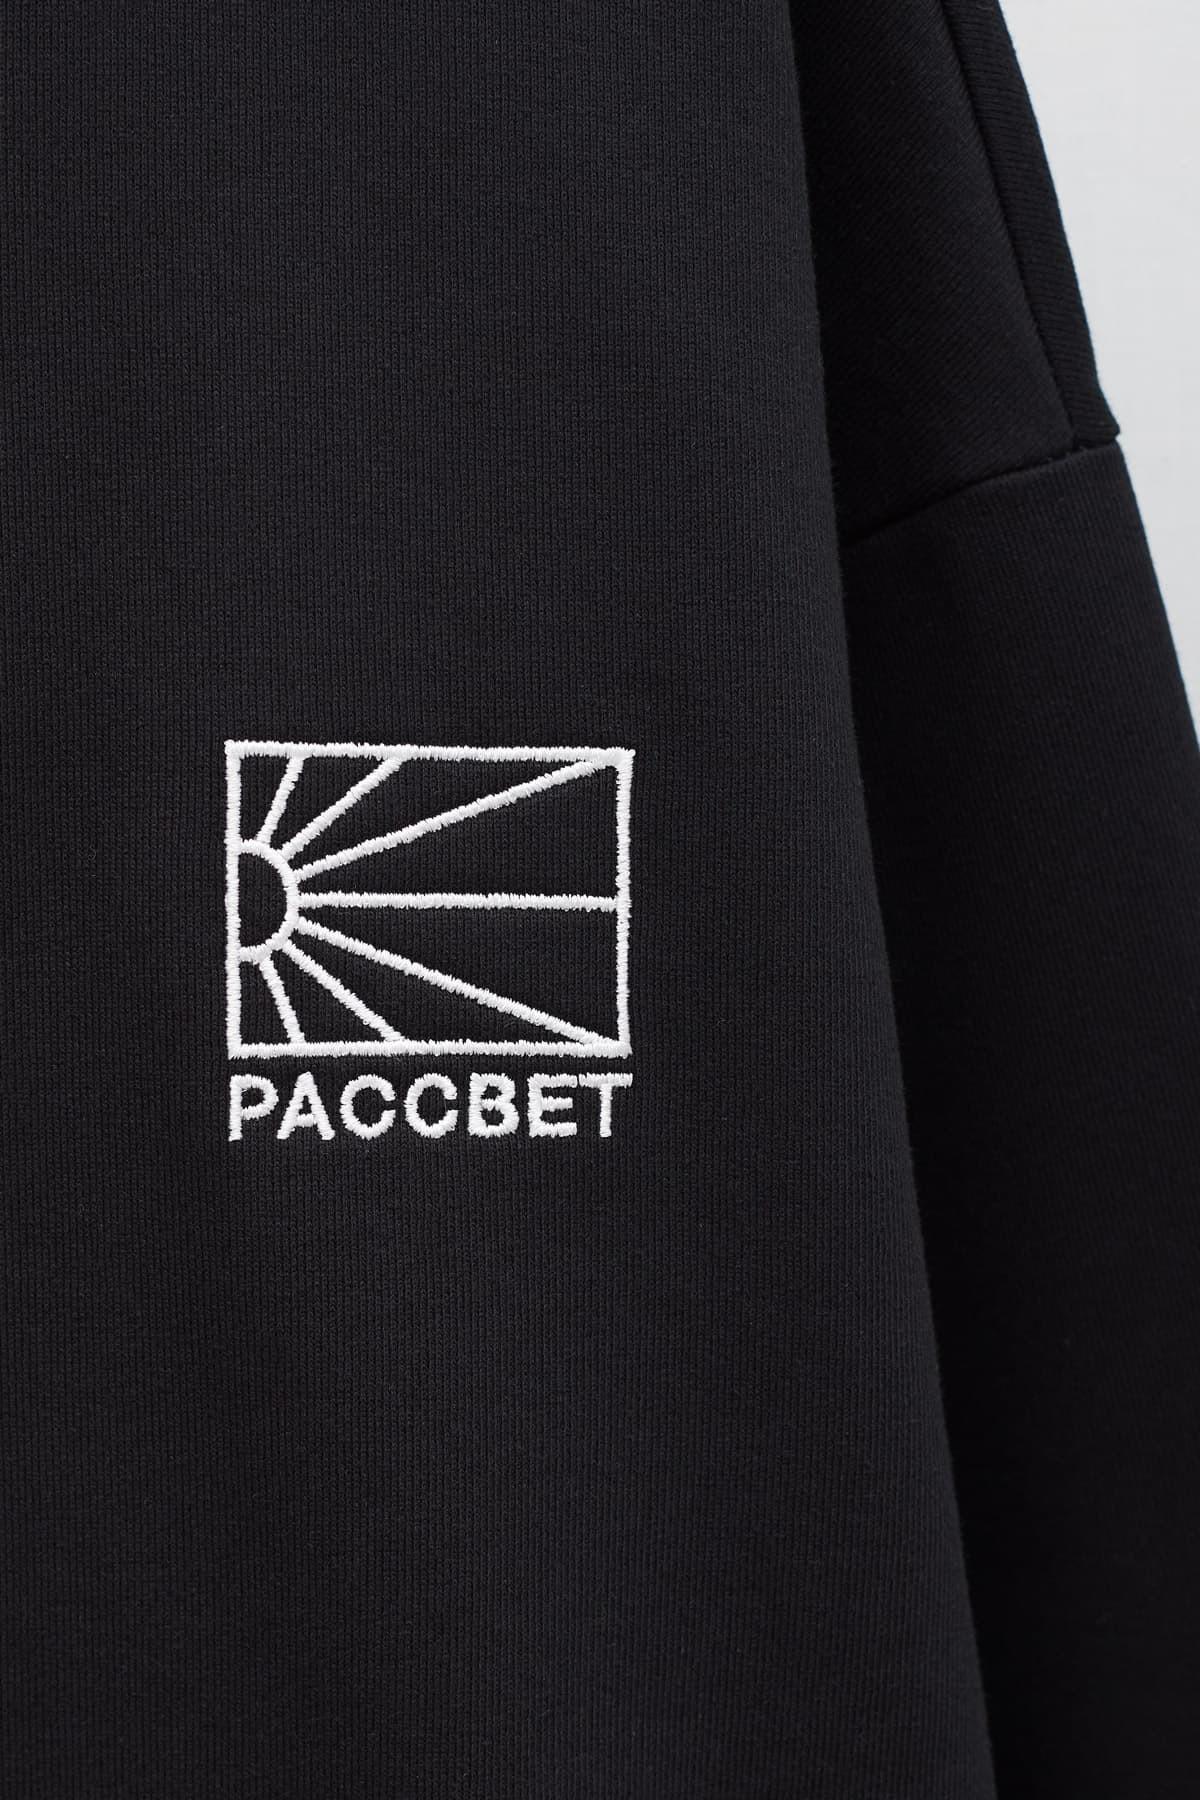 Comprar Daily Paper Green Hiro Trouser